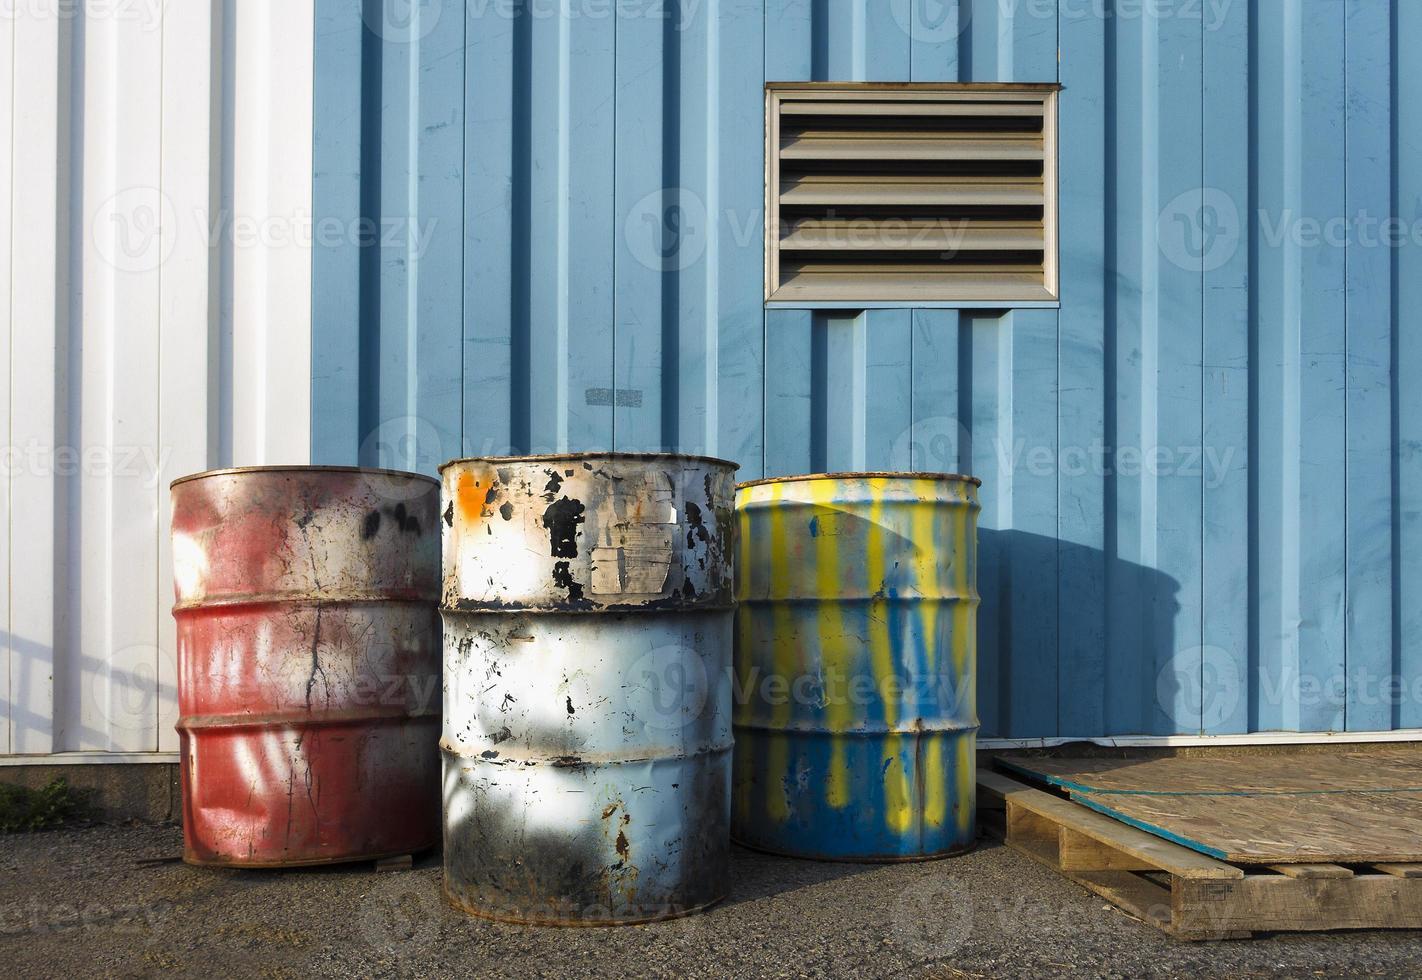 industriële 55 gallon drums foto